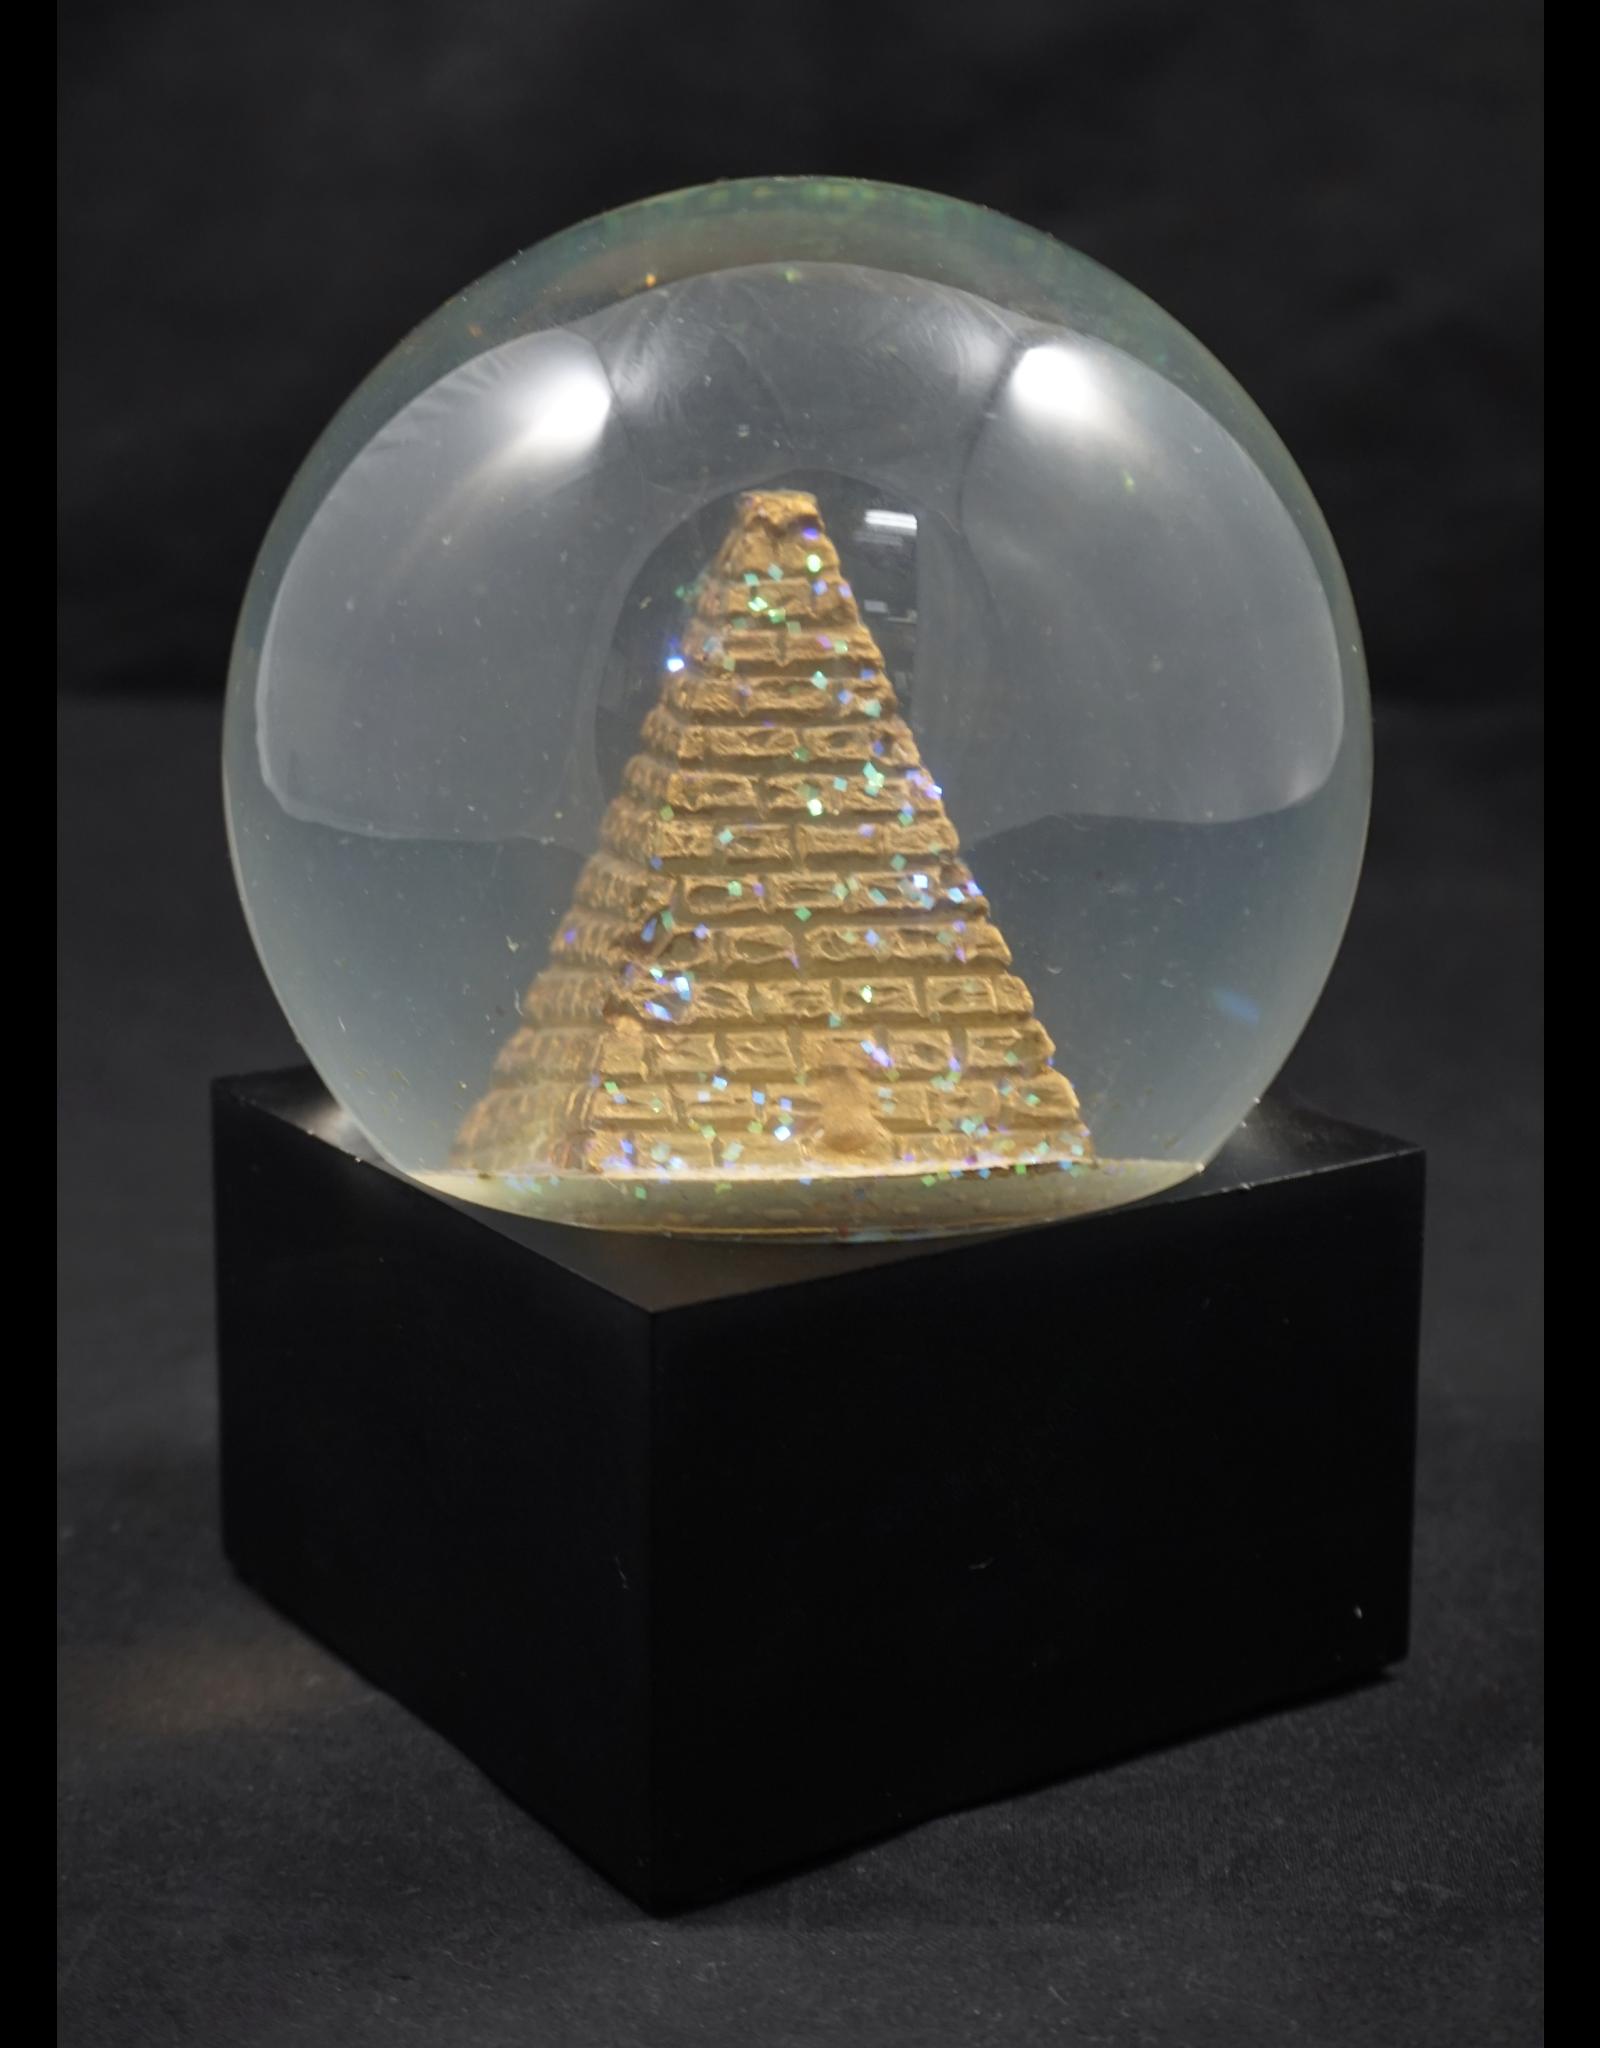 Egyptian Statue - LED Pyramid Water Globe